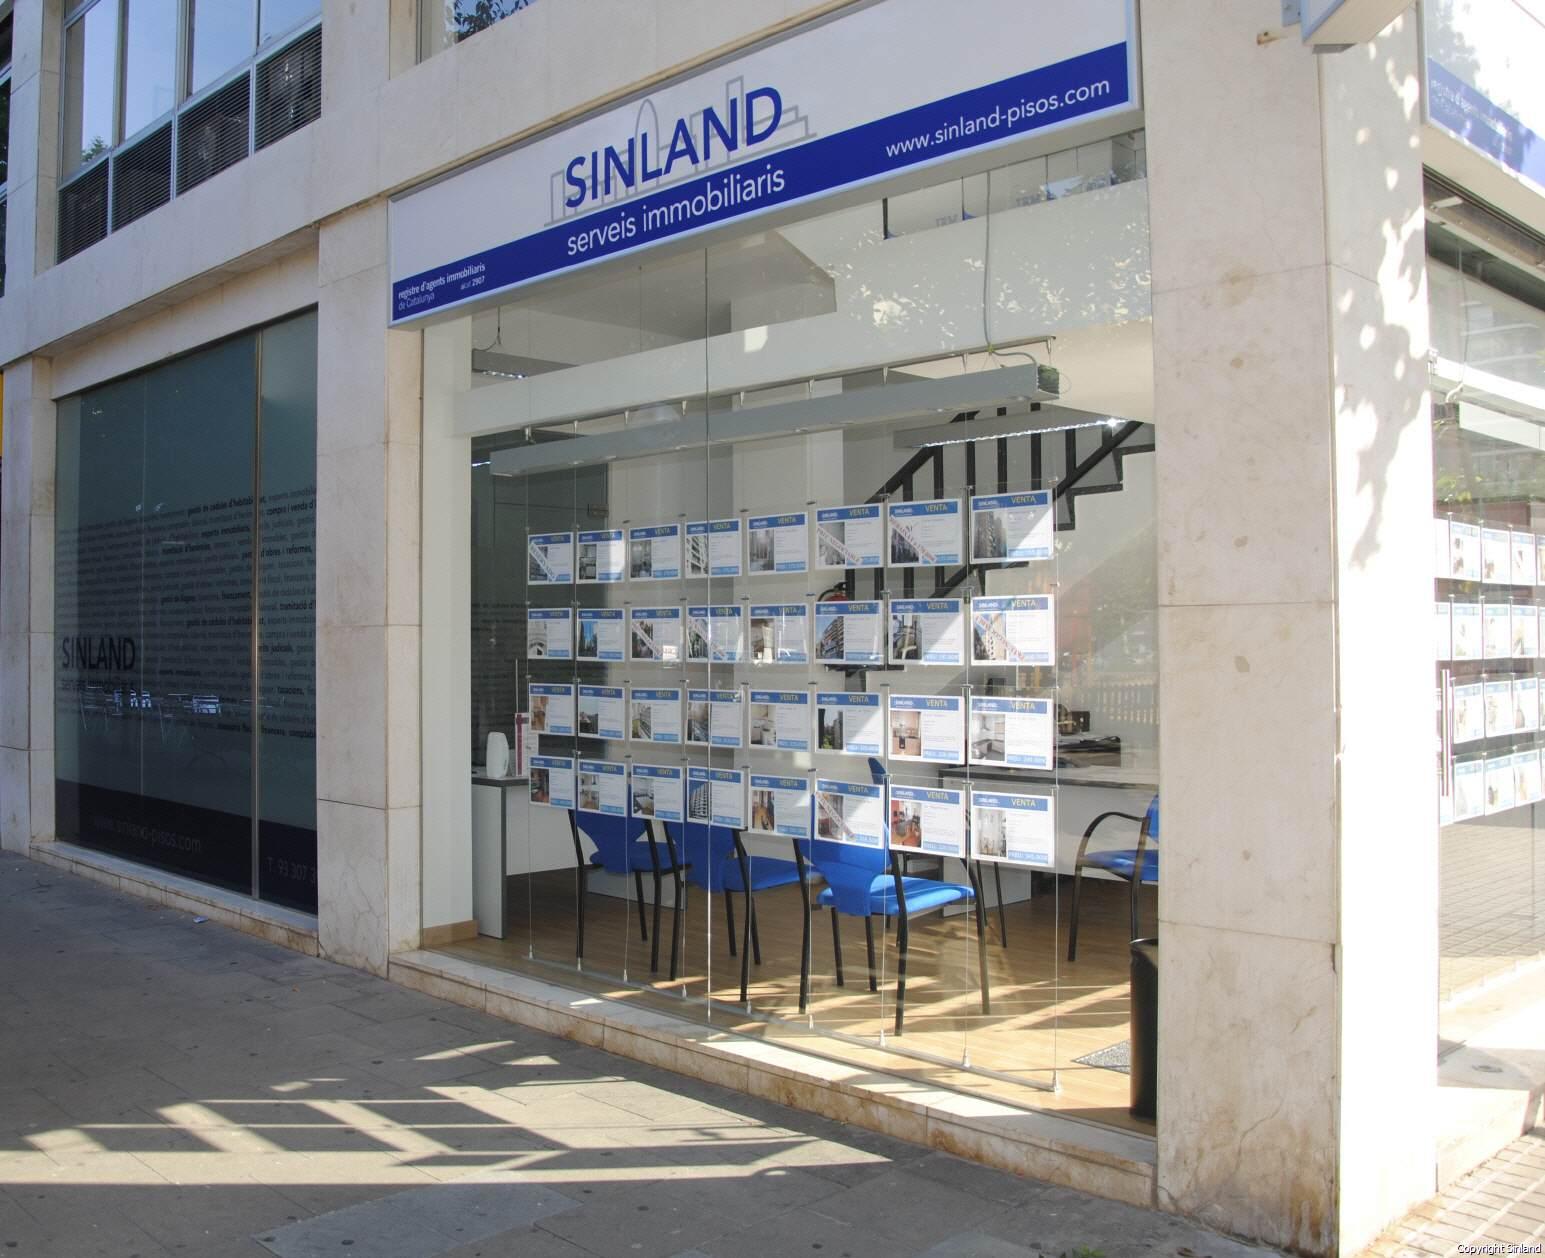 Sinland la inmobiliaria de barrio m s cercana a ti for Portales inmobiliarios barcelona